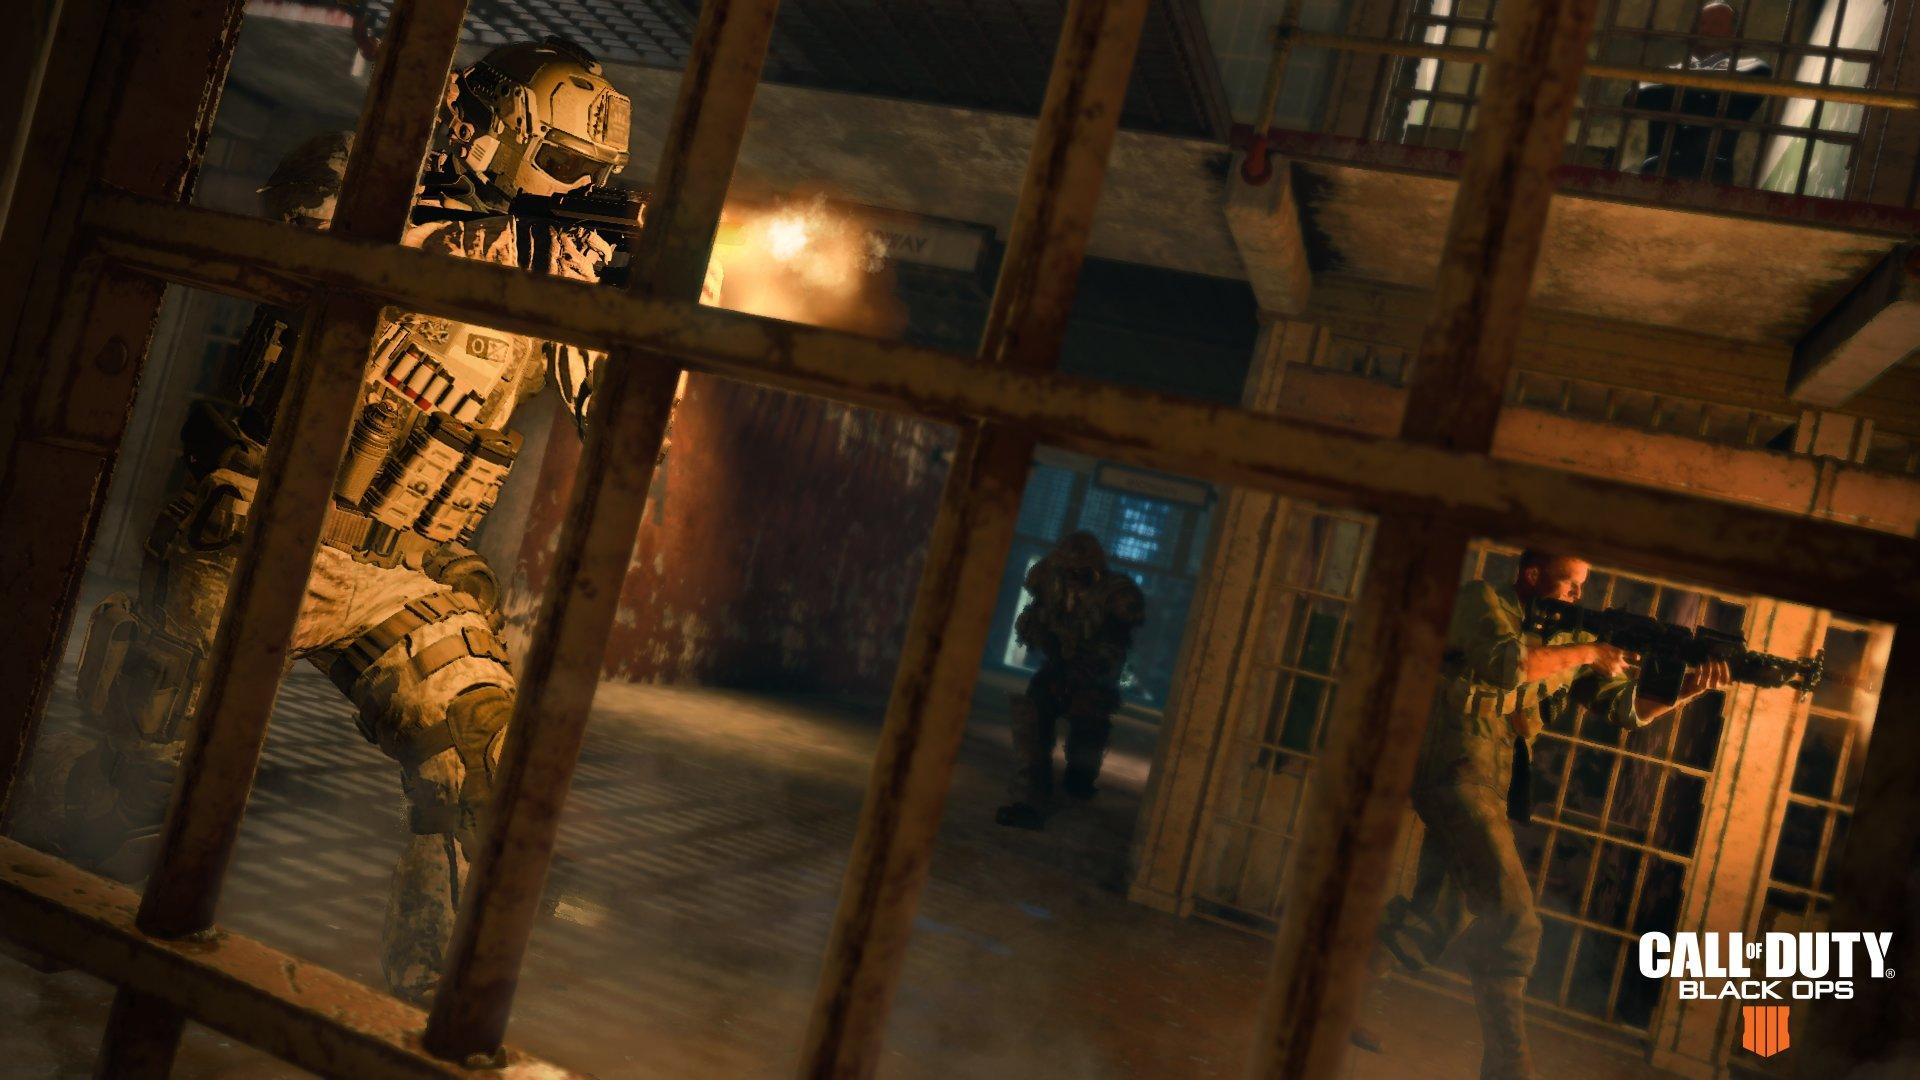 Call of Duty: Black Ops 4 – Blackout-Modus mit neuer Alcatraz-Karte (aktuell nur PS4) im April kostenlos spielbar